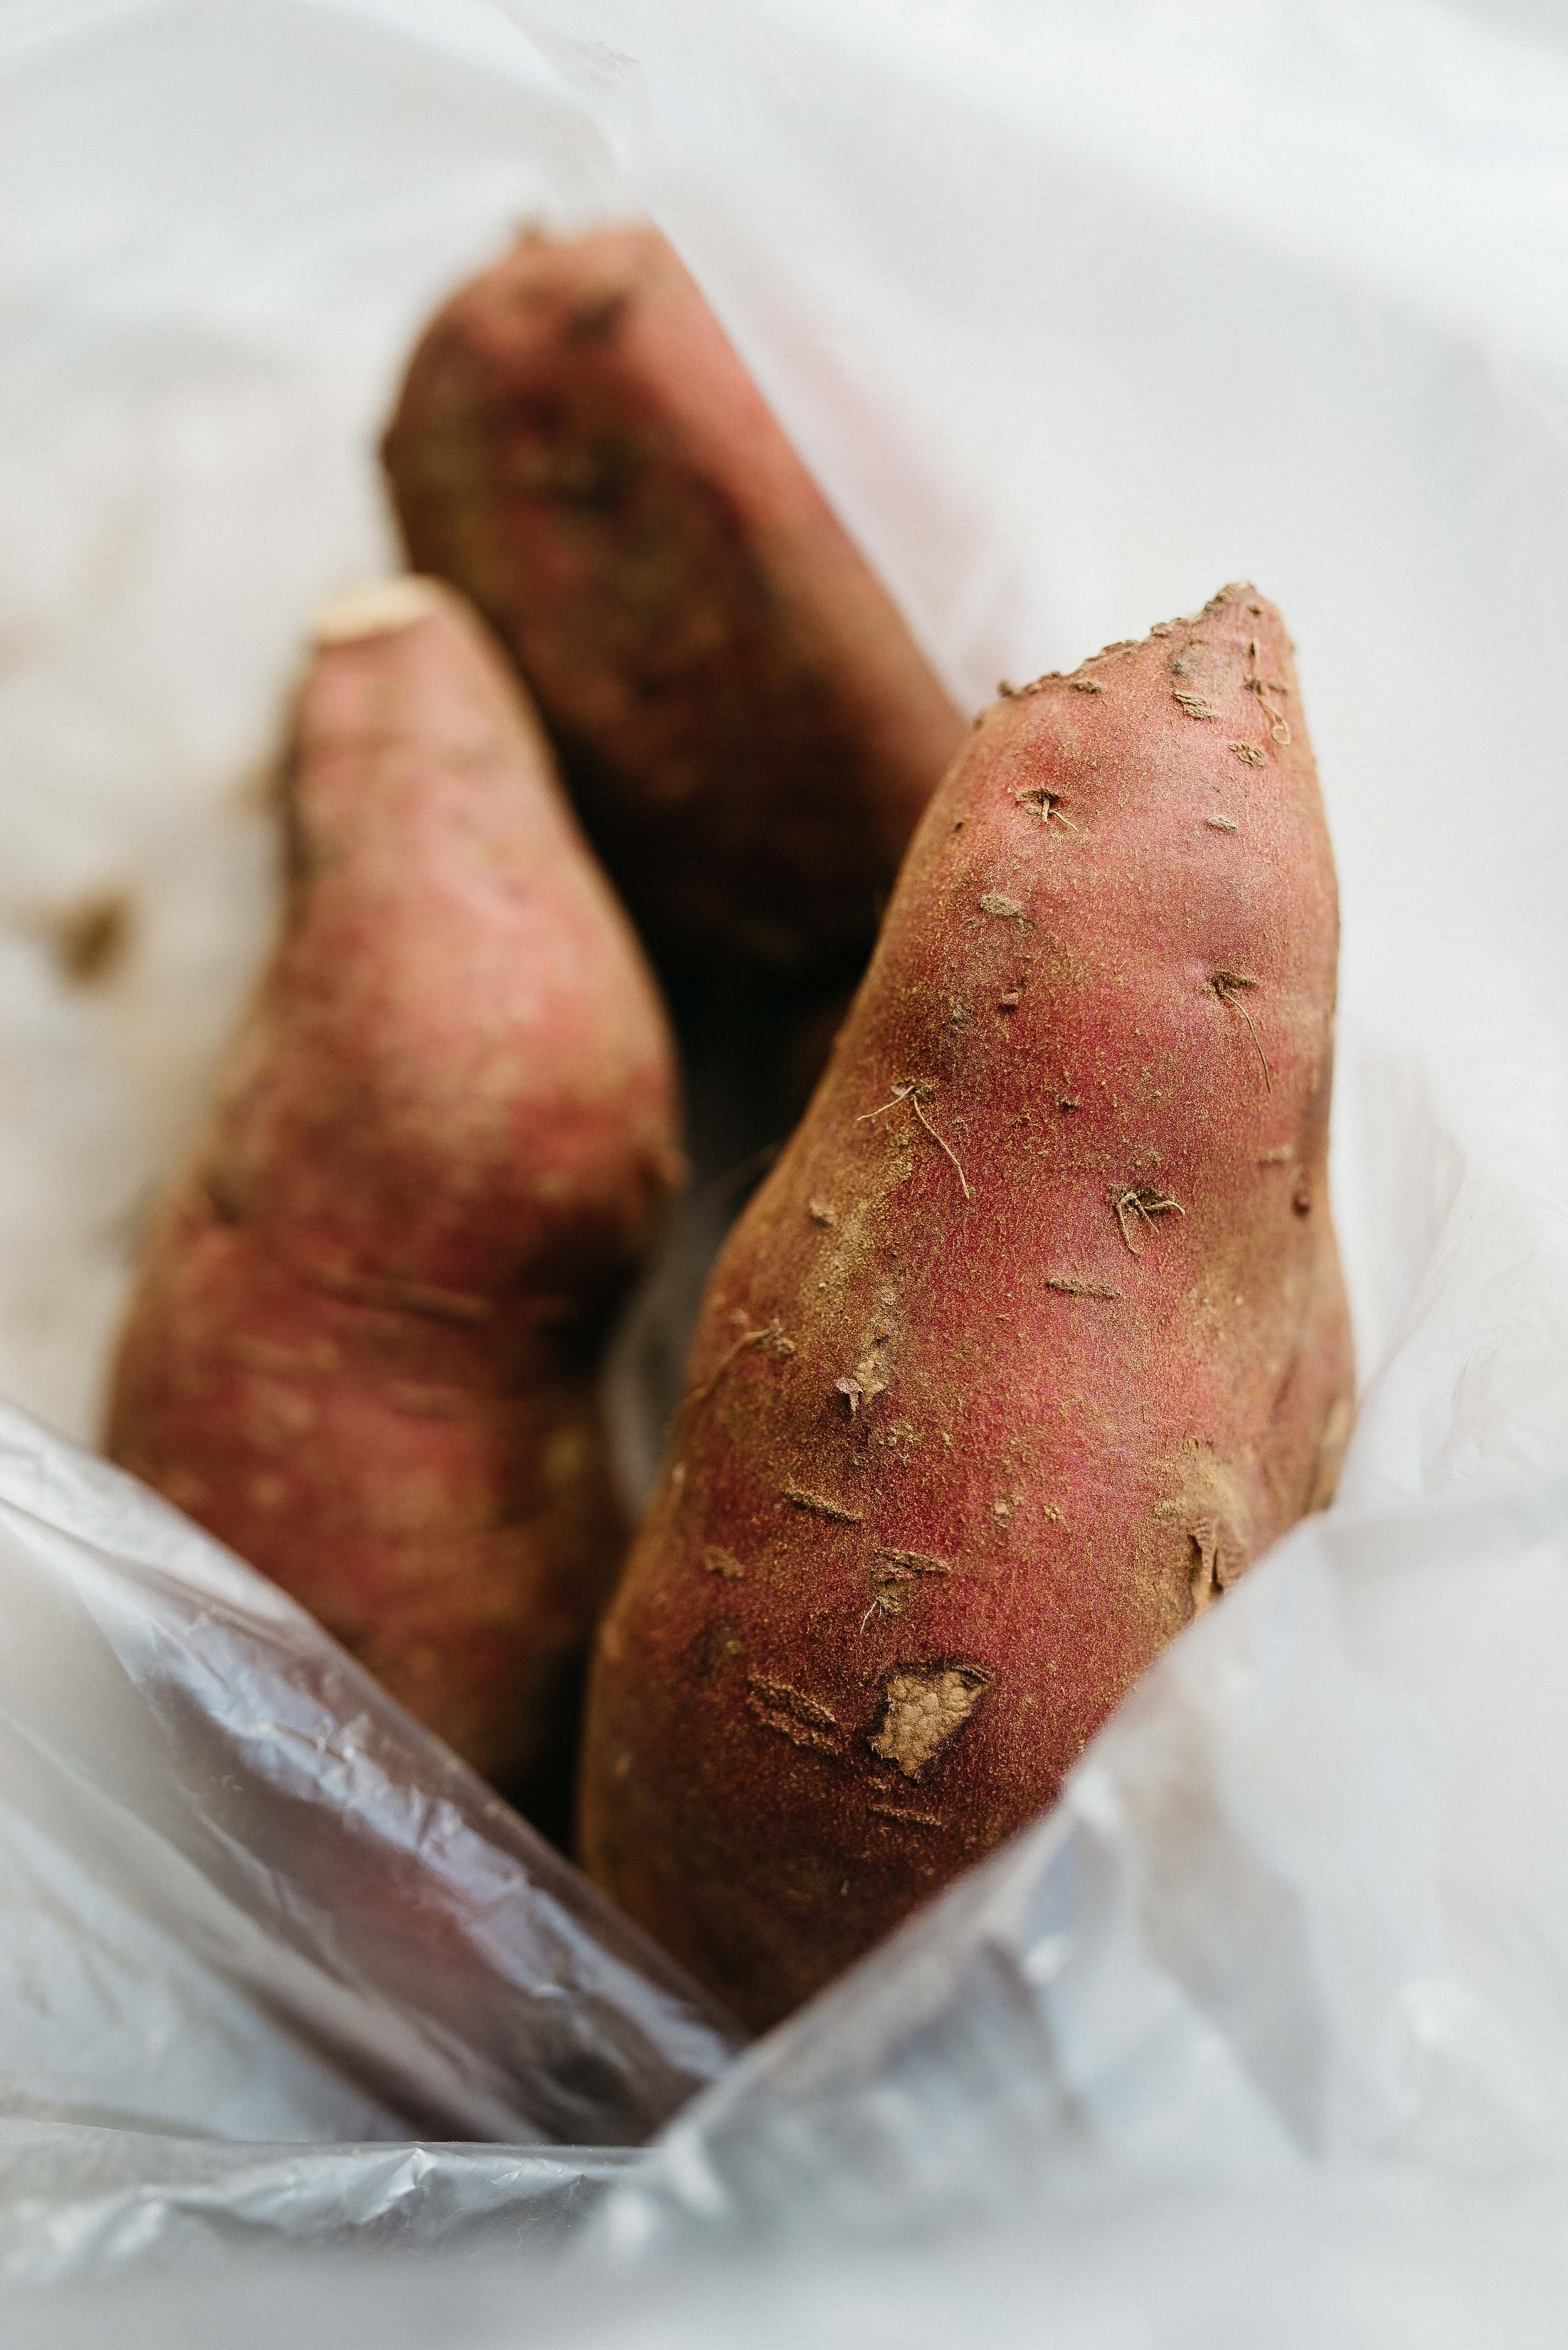 black lentil, sweet potato + kale chili w/ kabocha biscuits (v + gf) | dolly and oatmeal